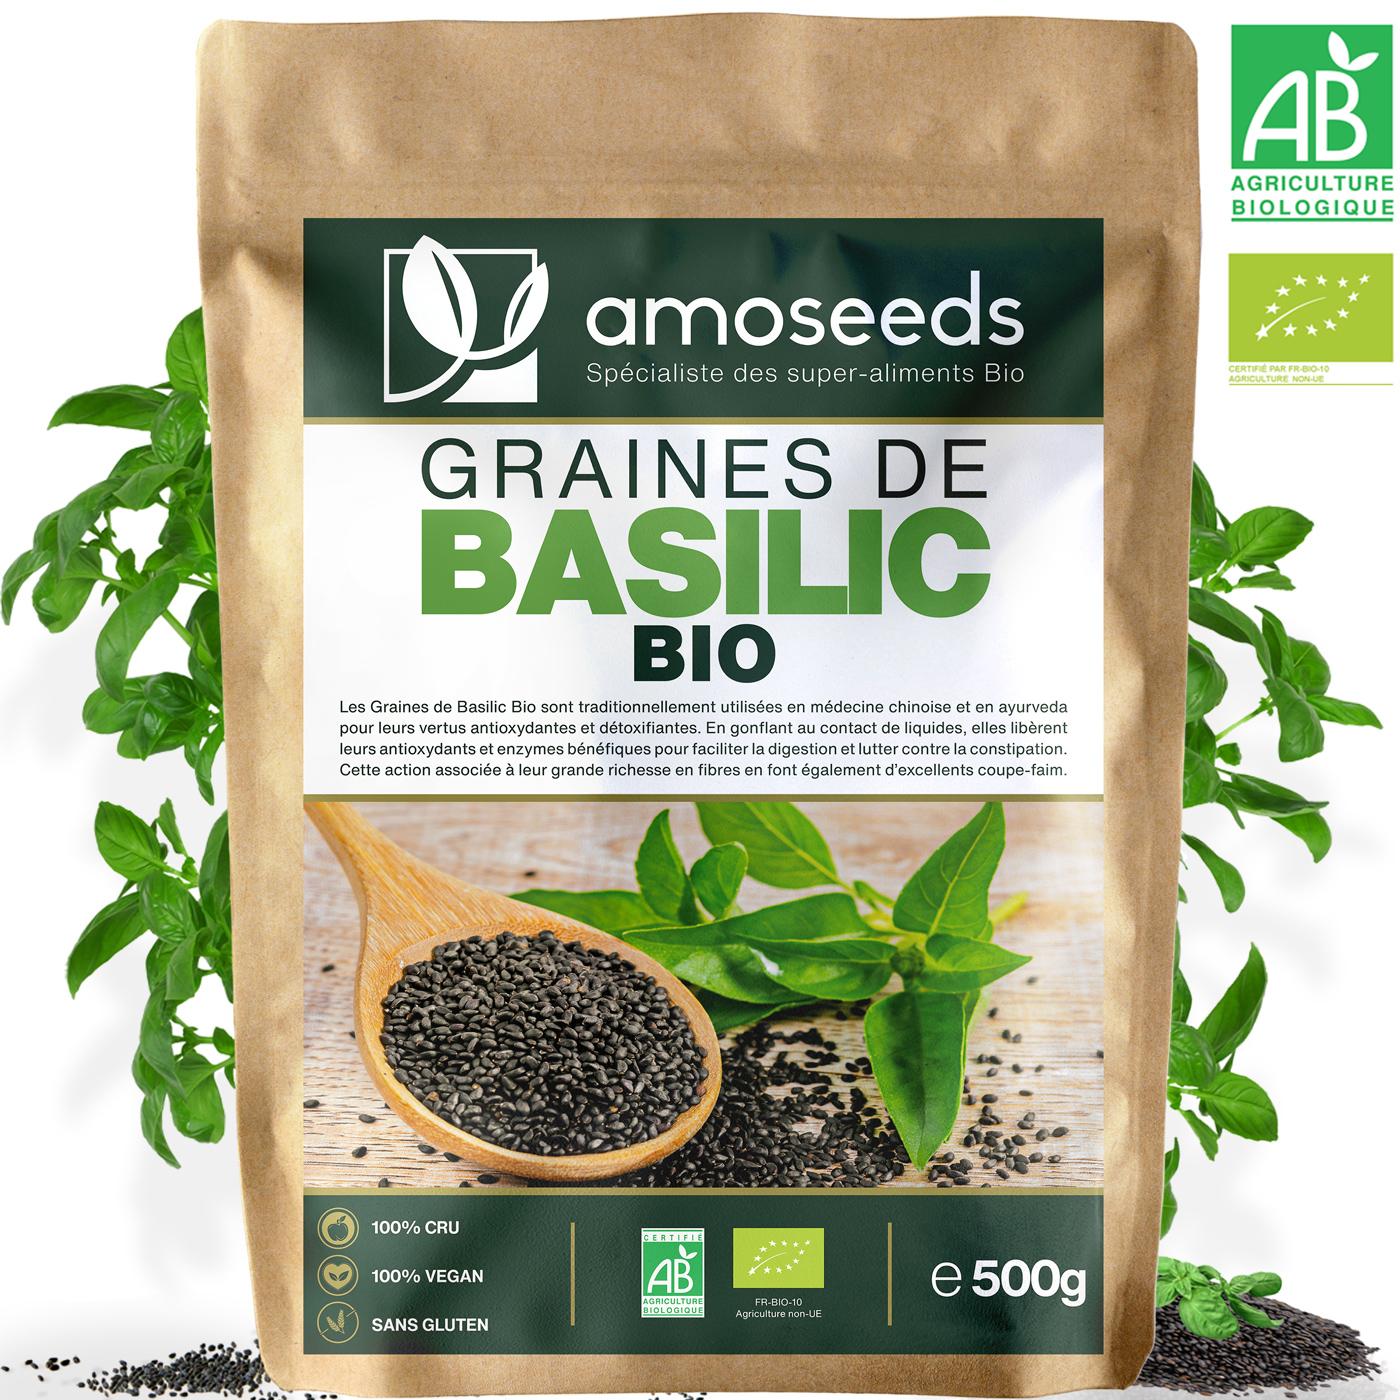 amoseeds - Graines de Basilic Bio 500g